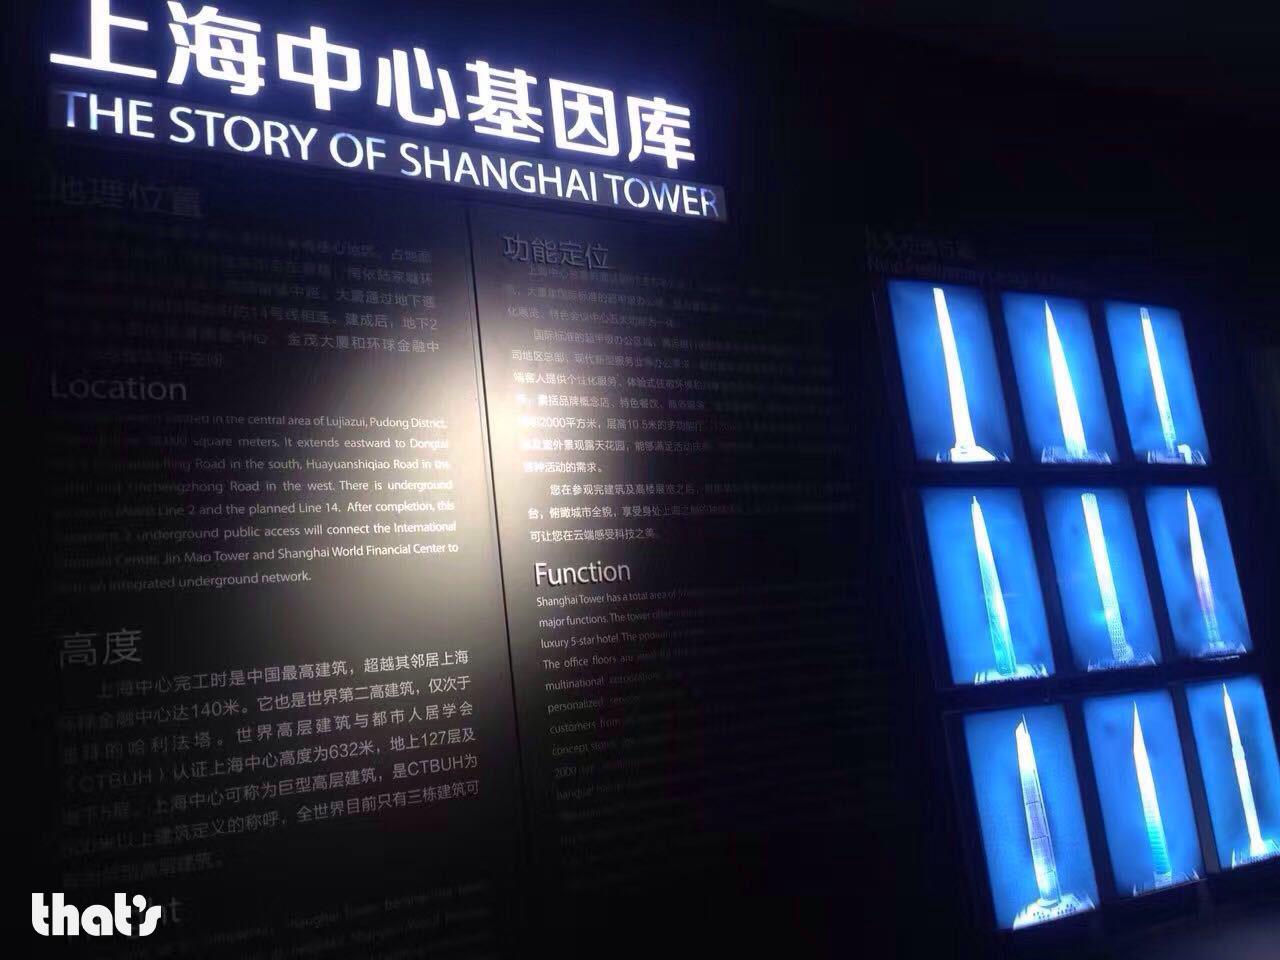 Shanghai Tower observatory